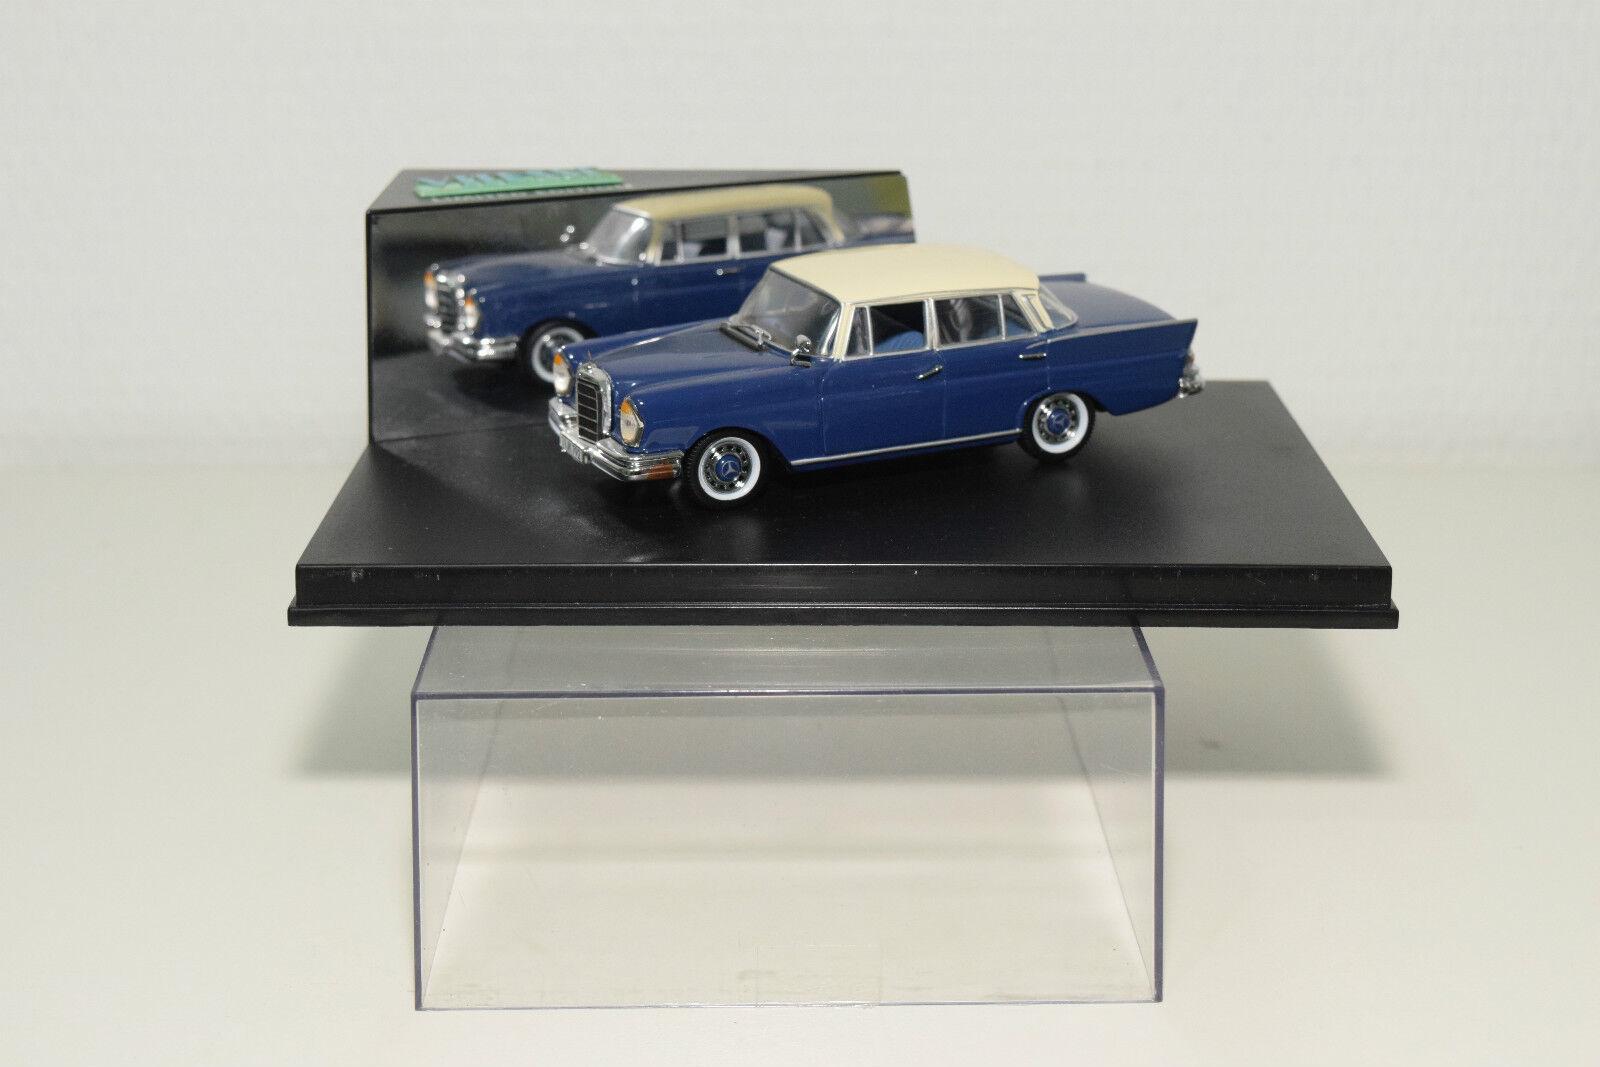 .vitesse 047b 047 b mercedes - benz 220se blaue 220 se 1959 blaue 220se mint umzingelt 9807b9